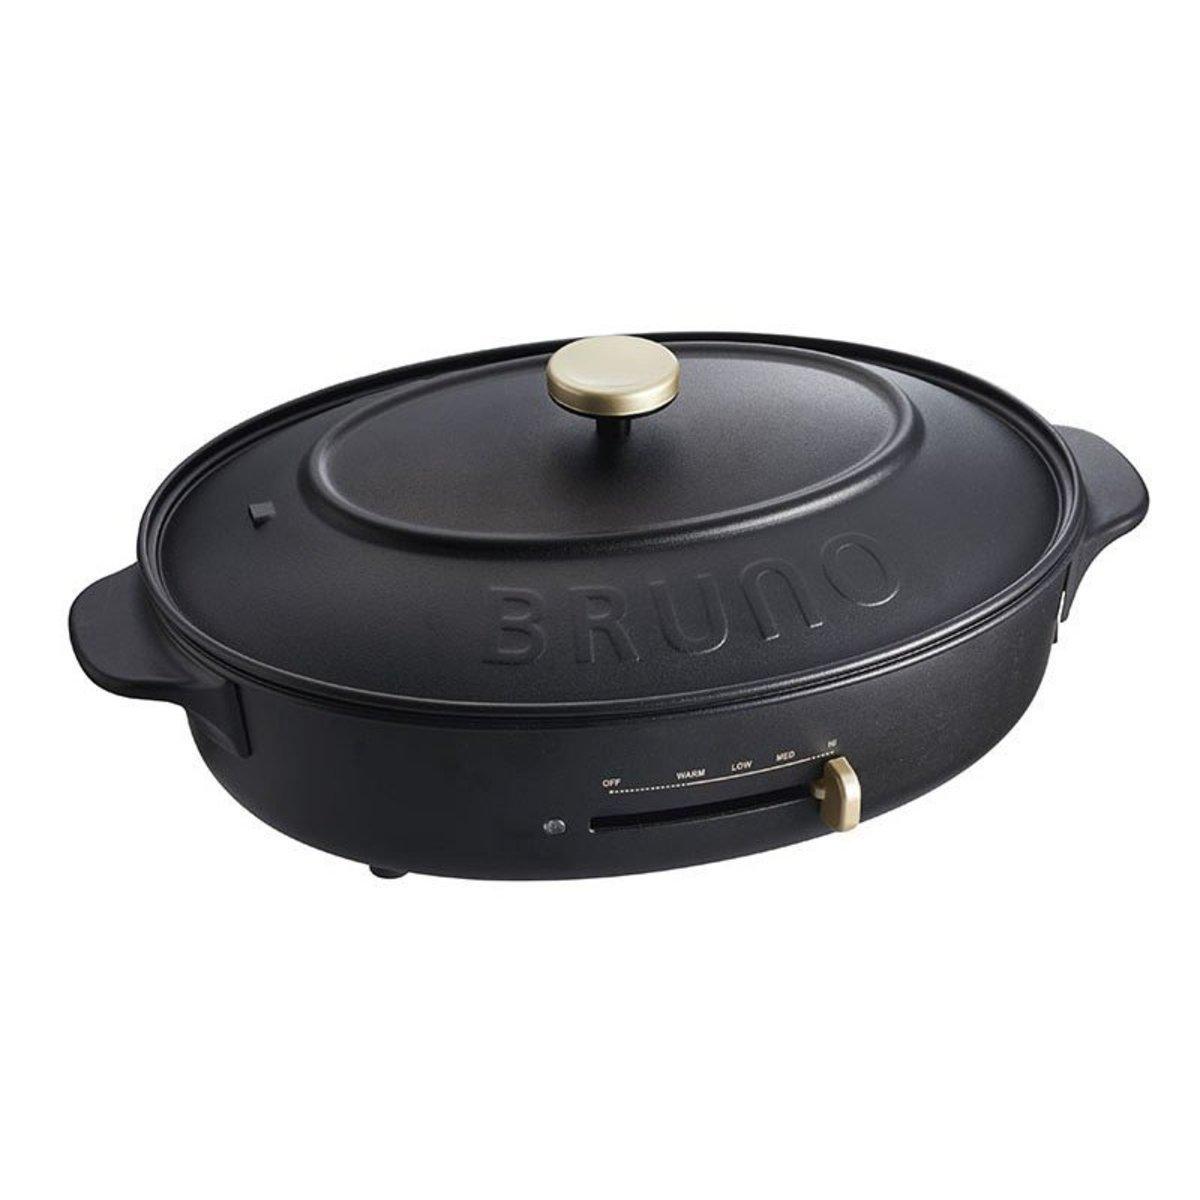 BOE053-BK Oval Hot Plate Black